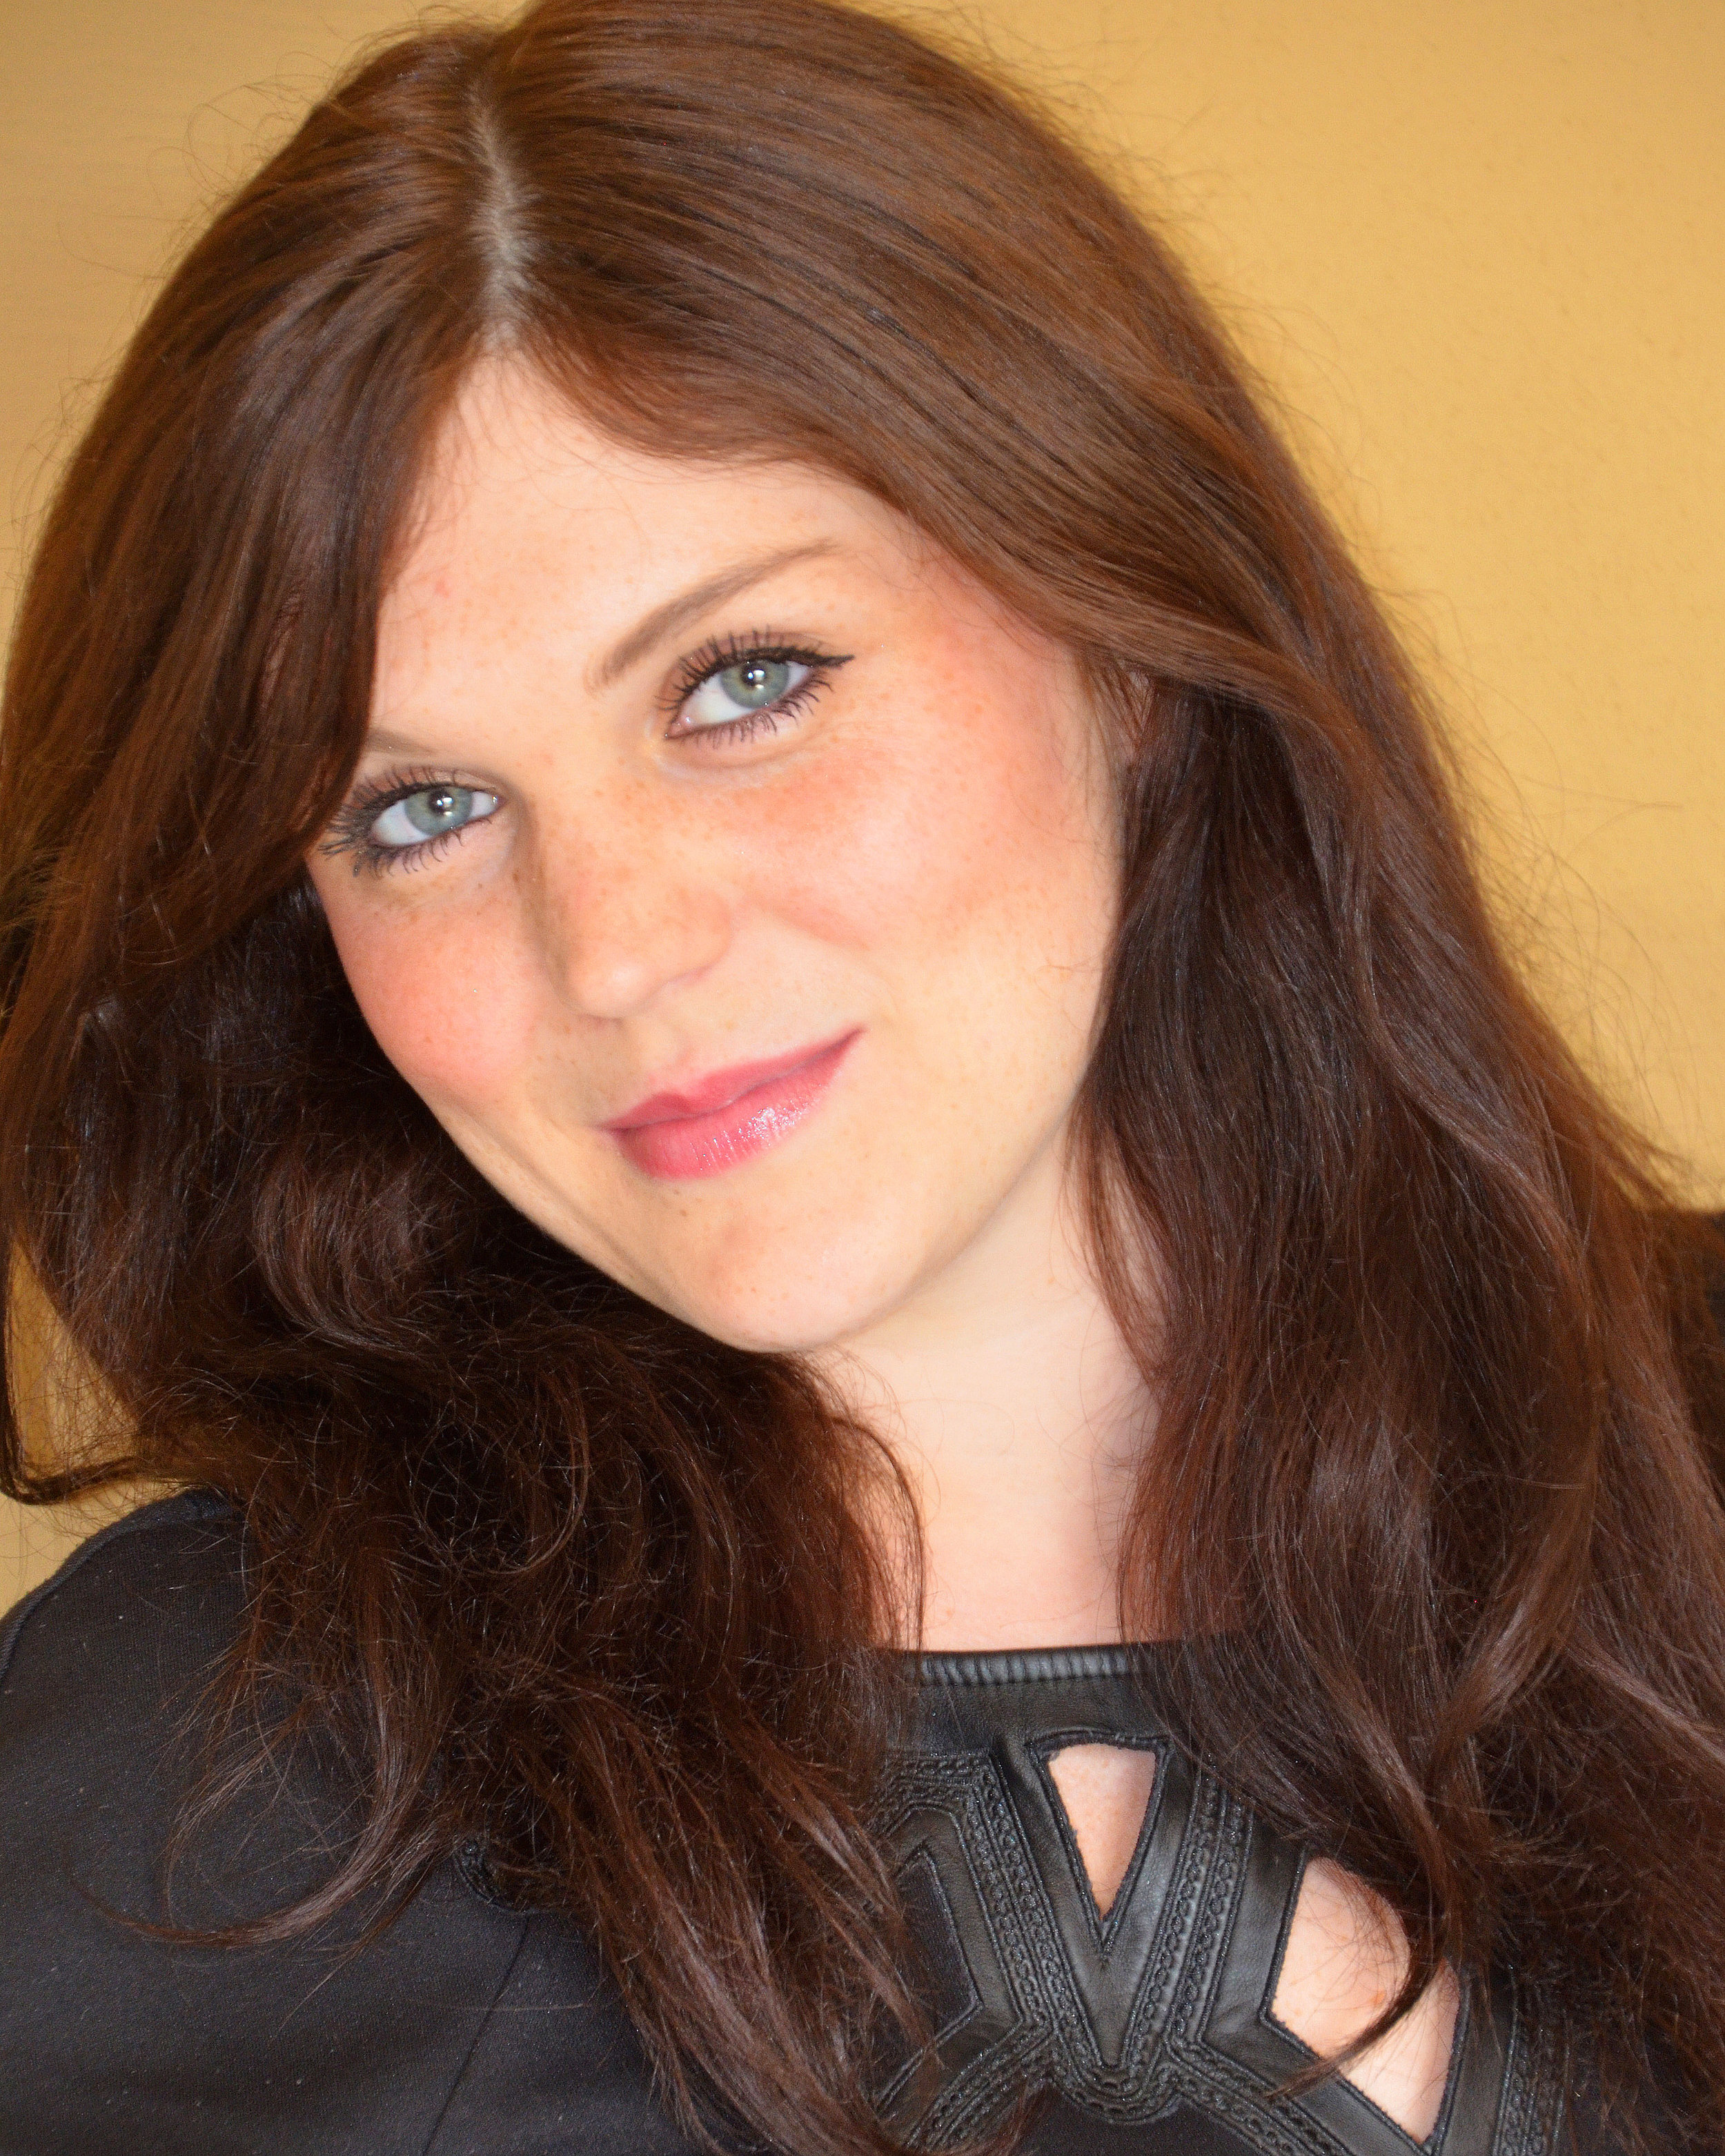 Grace Sloane